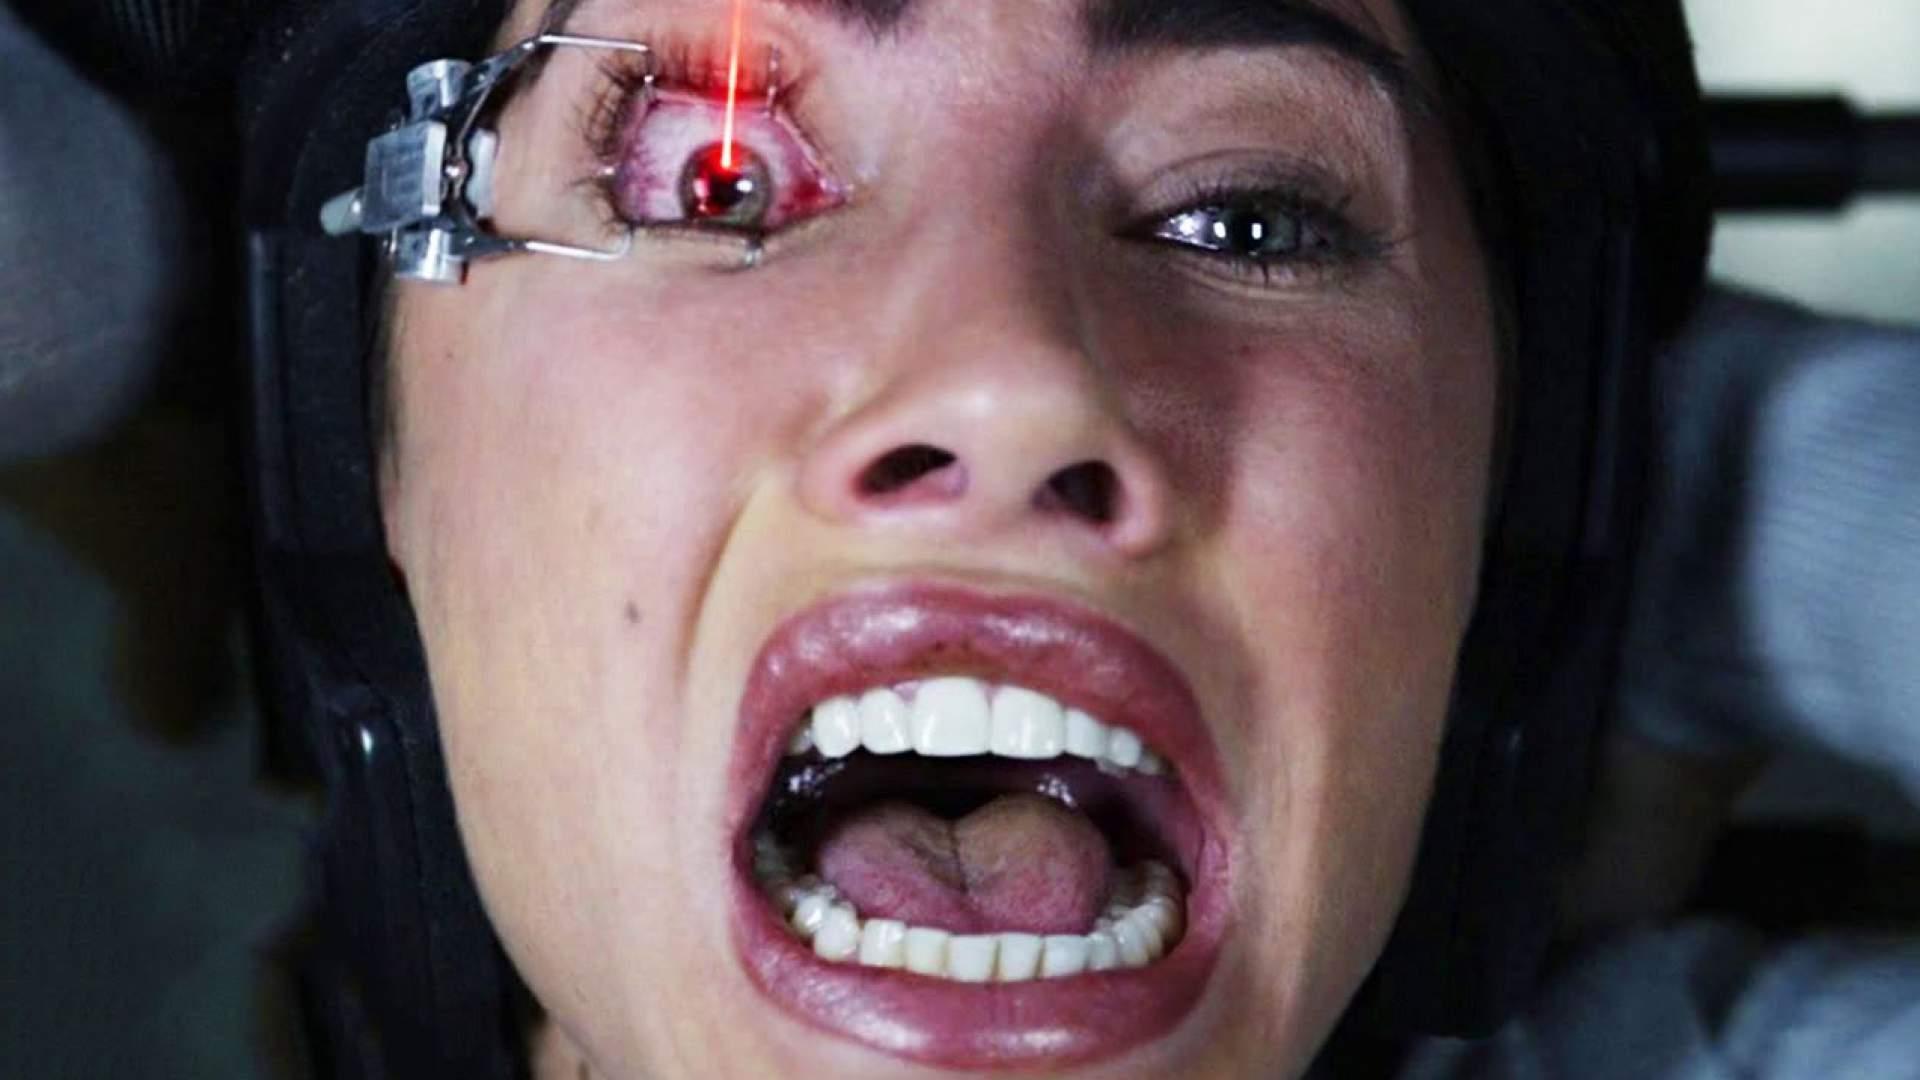 VIDEO: Fünf echt abartige Horror-Filmtode! 'Frittierte Hoden' sind da nur der Anfang.